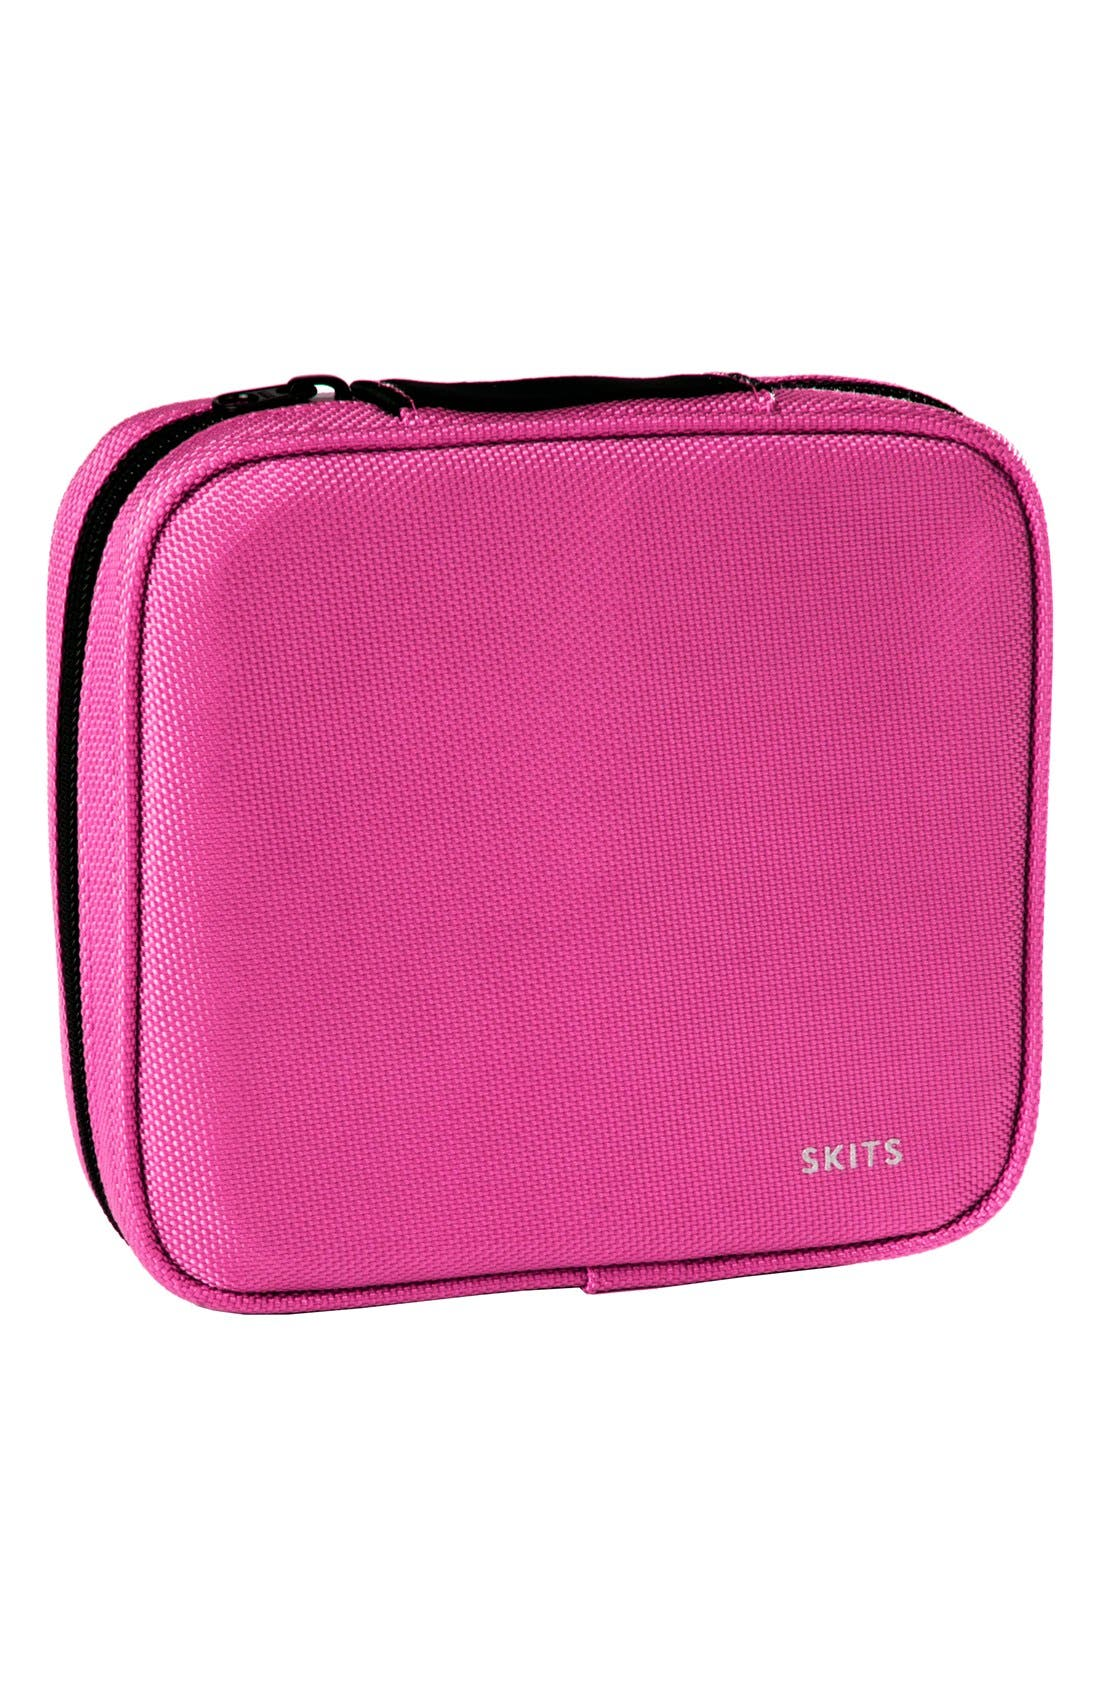 Main Image - SKITS 'Smart' Tech Accessories & Cables Case